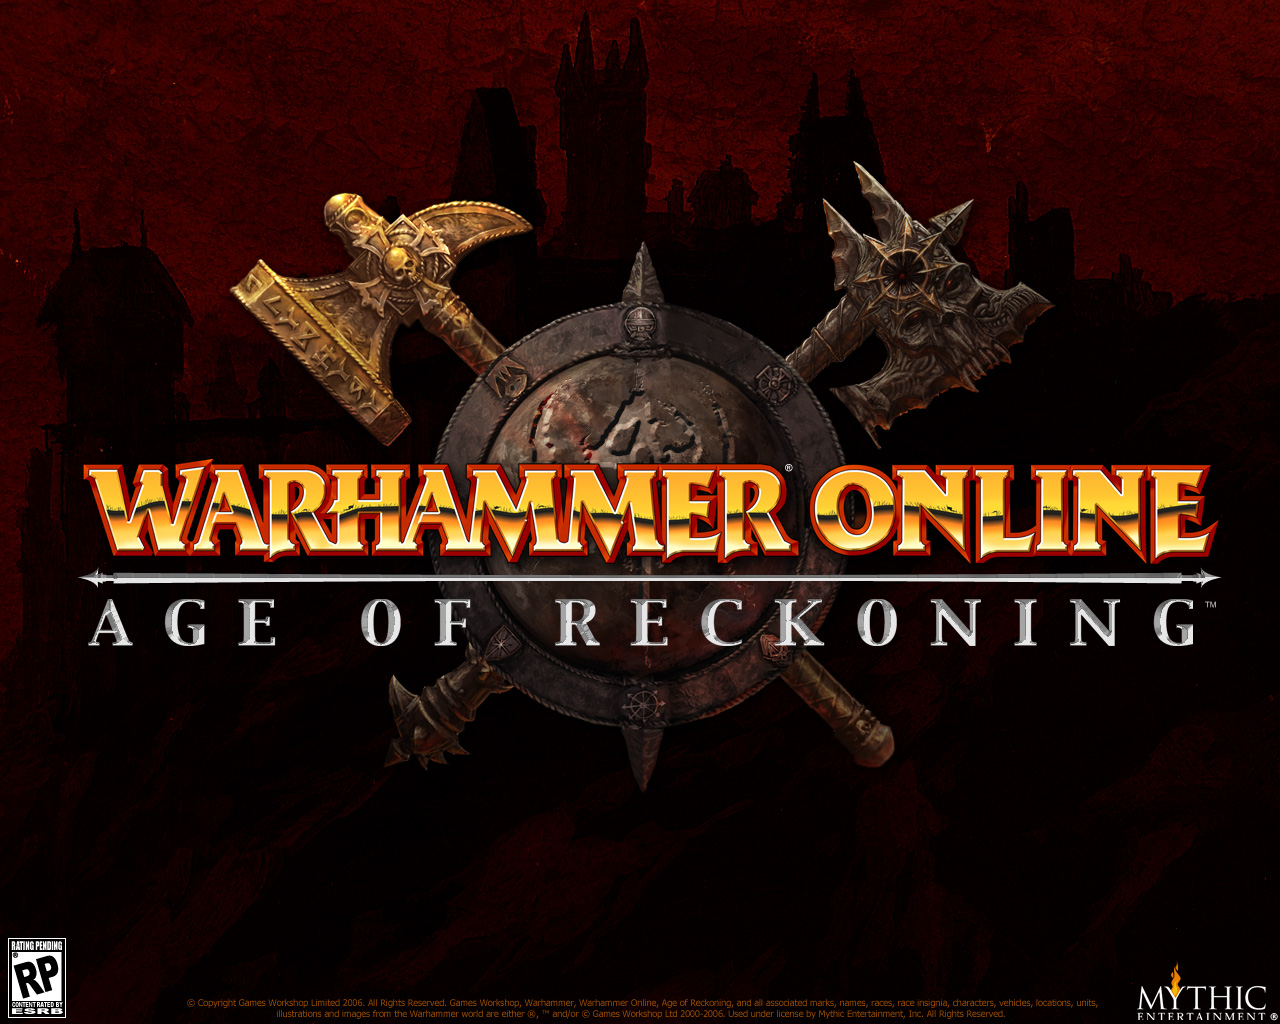 [MMORPG] Warhammer Online dans Jeux vidéo WarhammerOnlineAoR